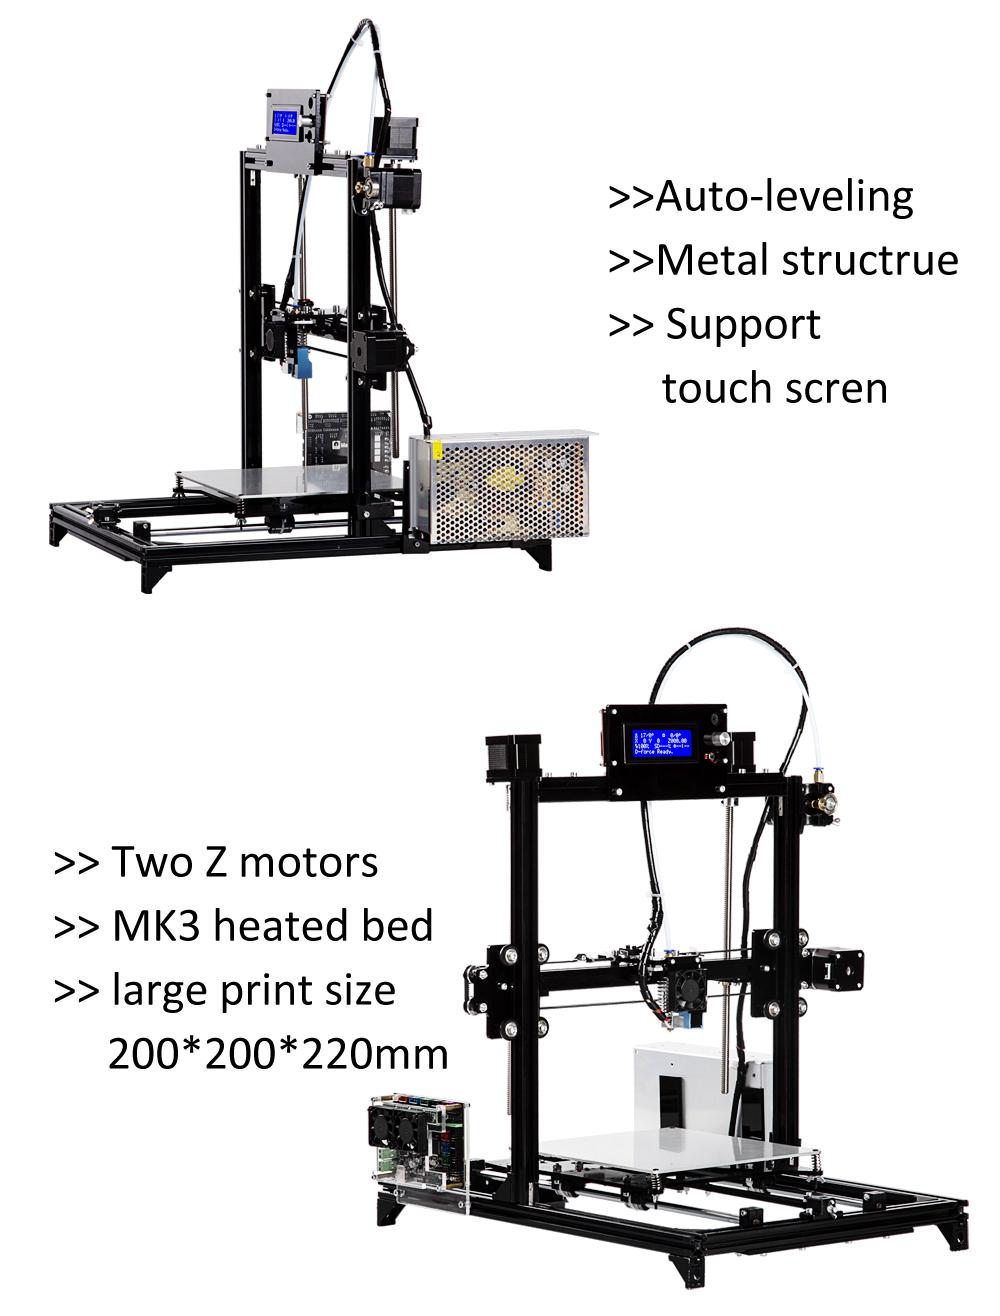 Wiring 3d Diagram Printer Jgaurora 3D Printing Diagram